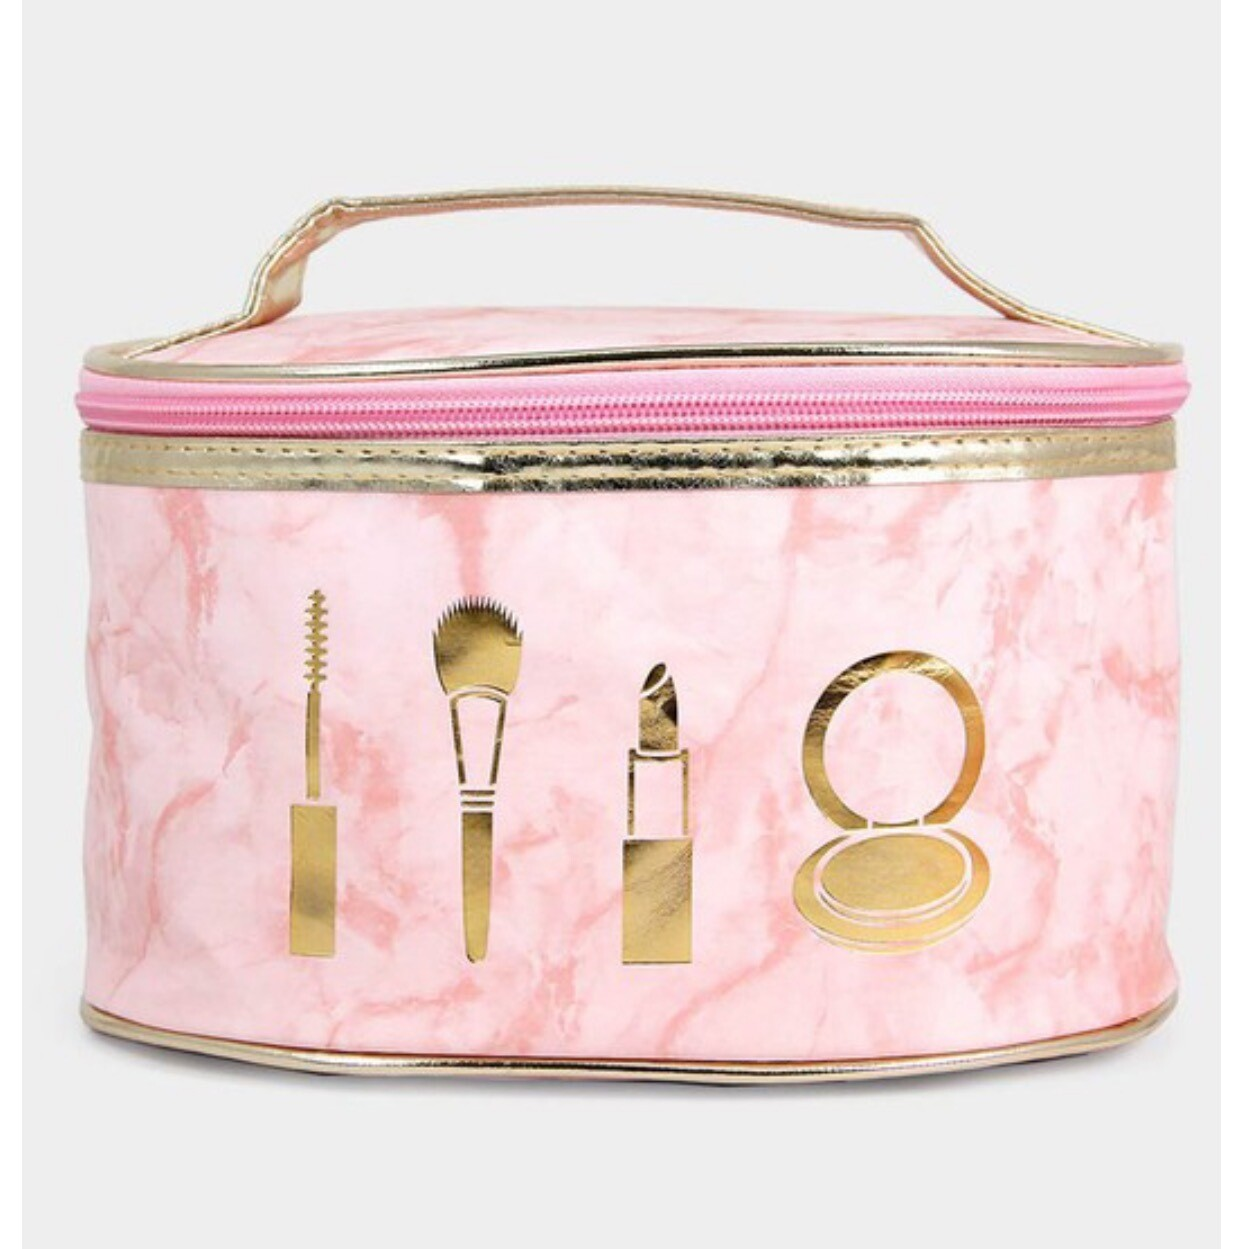 Zippered Make-up Bag - Pink Marble